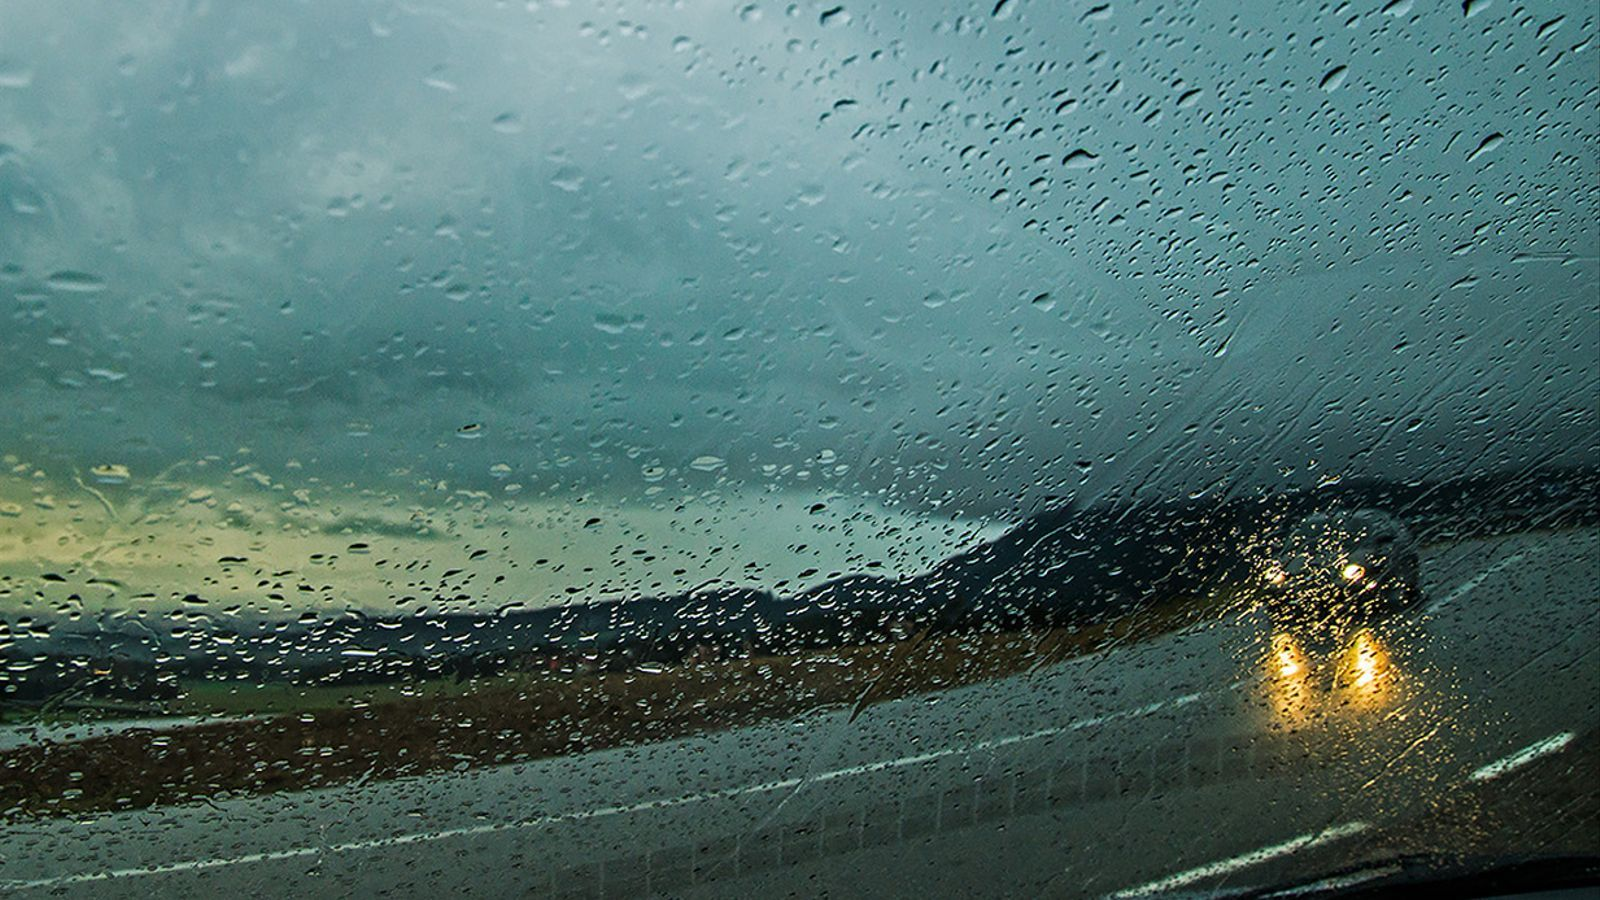 Pluja aquest matí a Gurb. EMILI VILAMALA